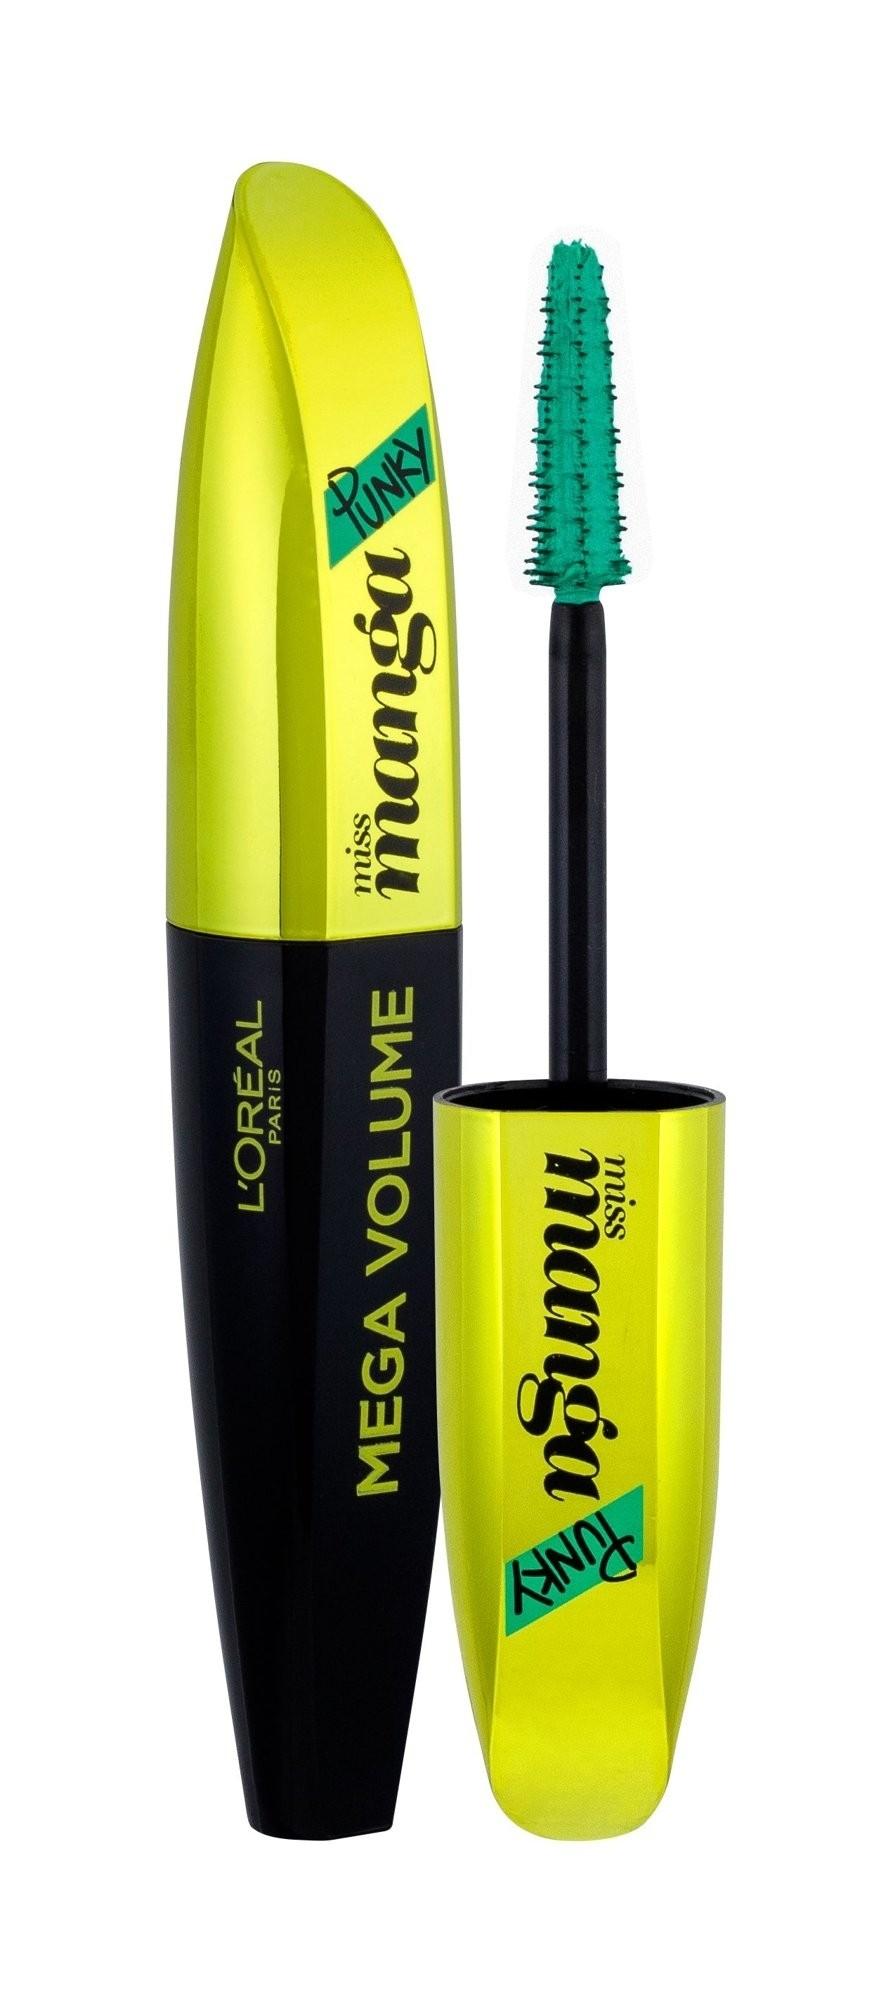 a6dca767dd0 ... Mega Volume Miss Manga Punky Mascara - Green. Brand: L'Oréal Paris